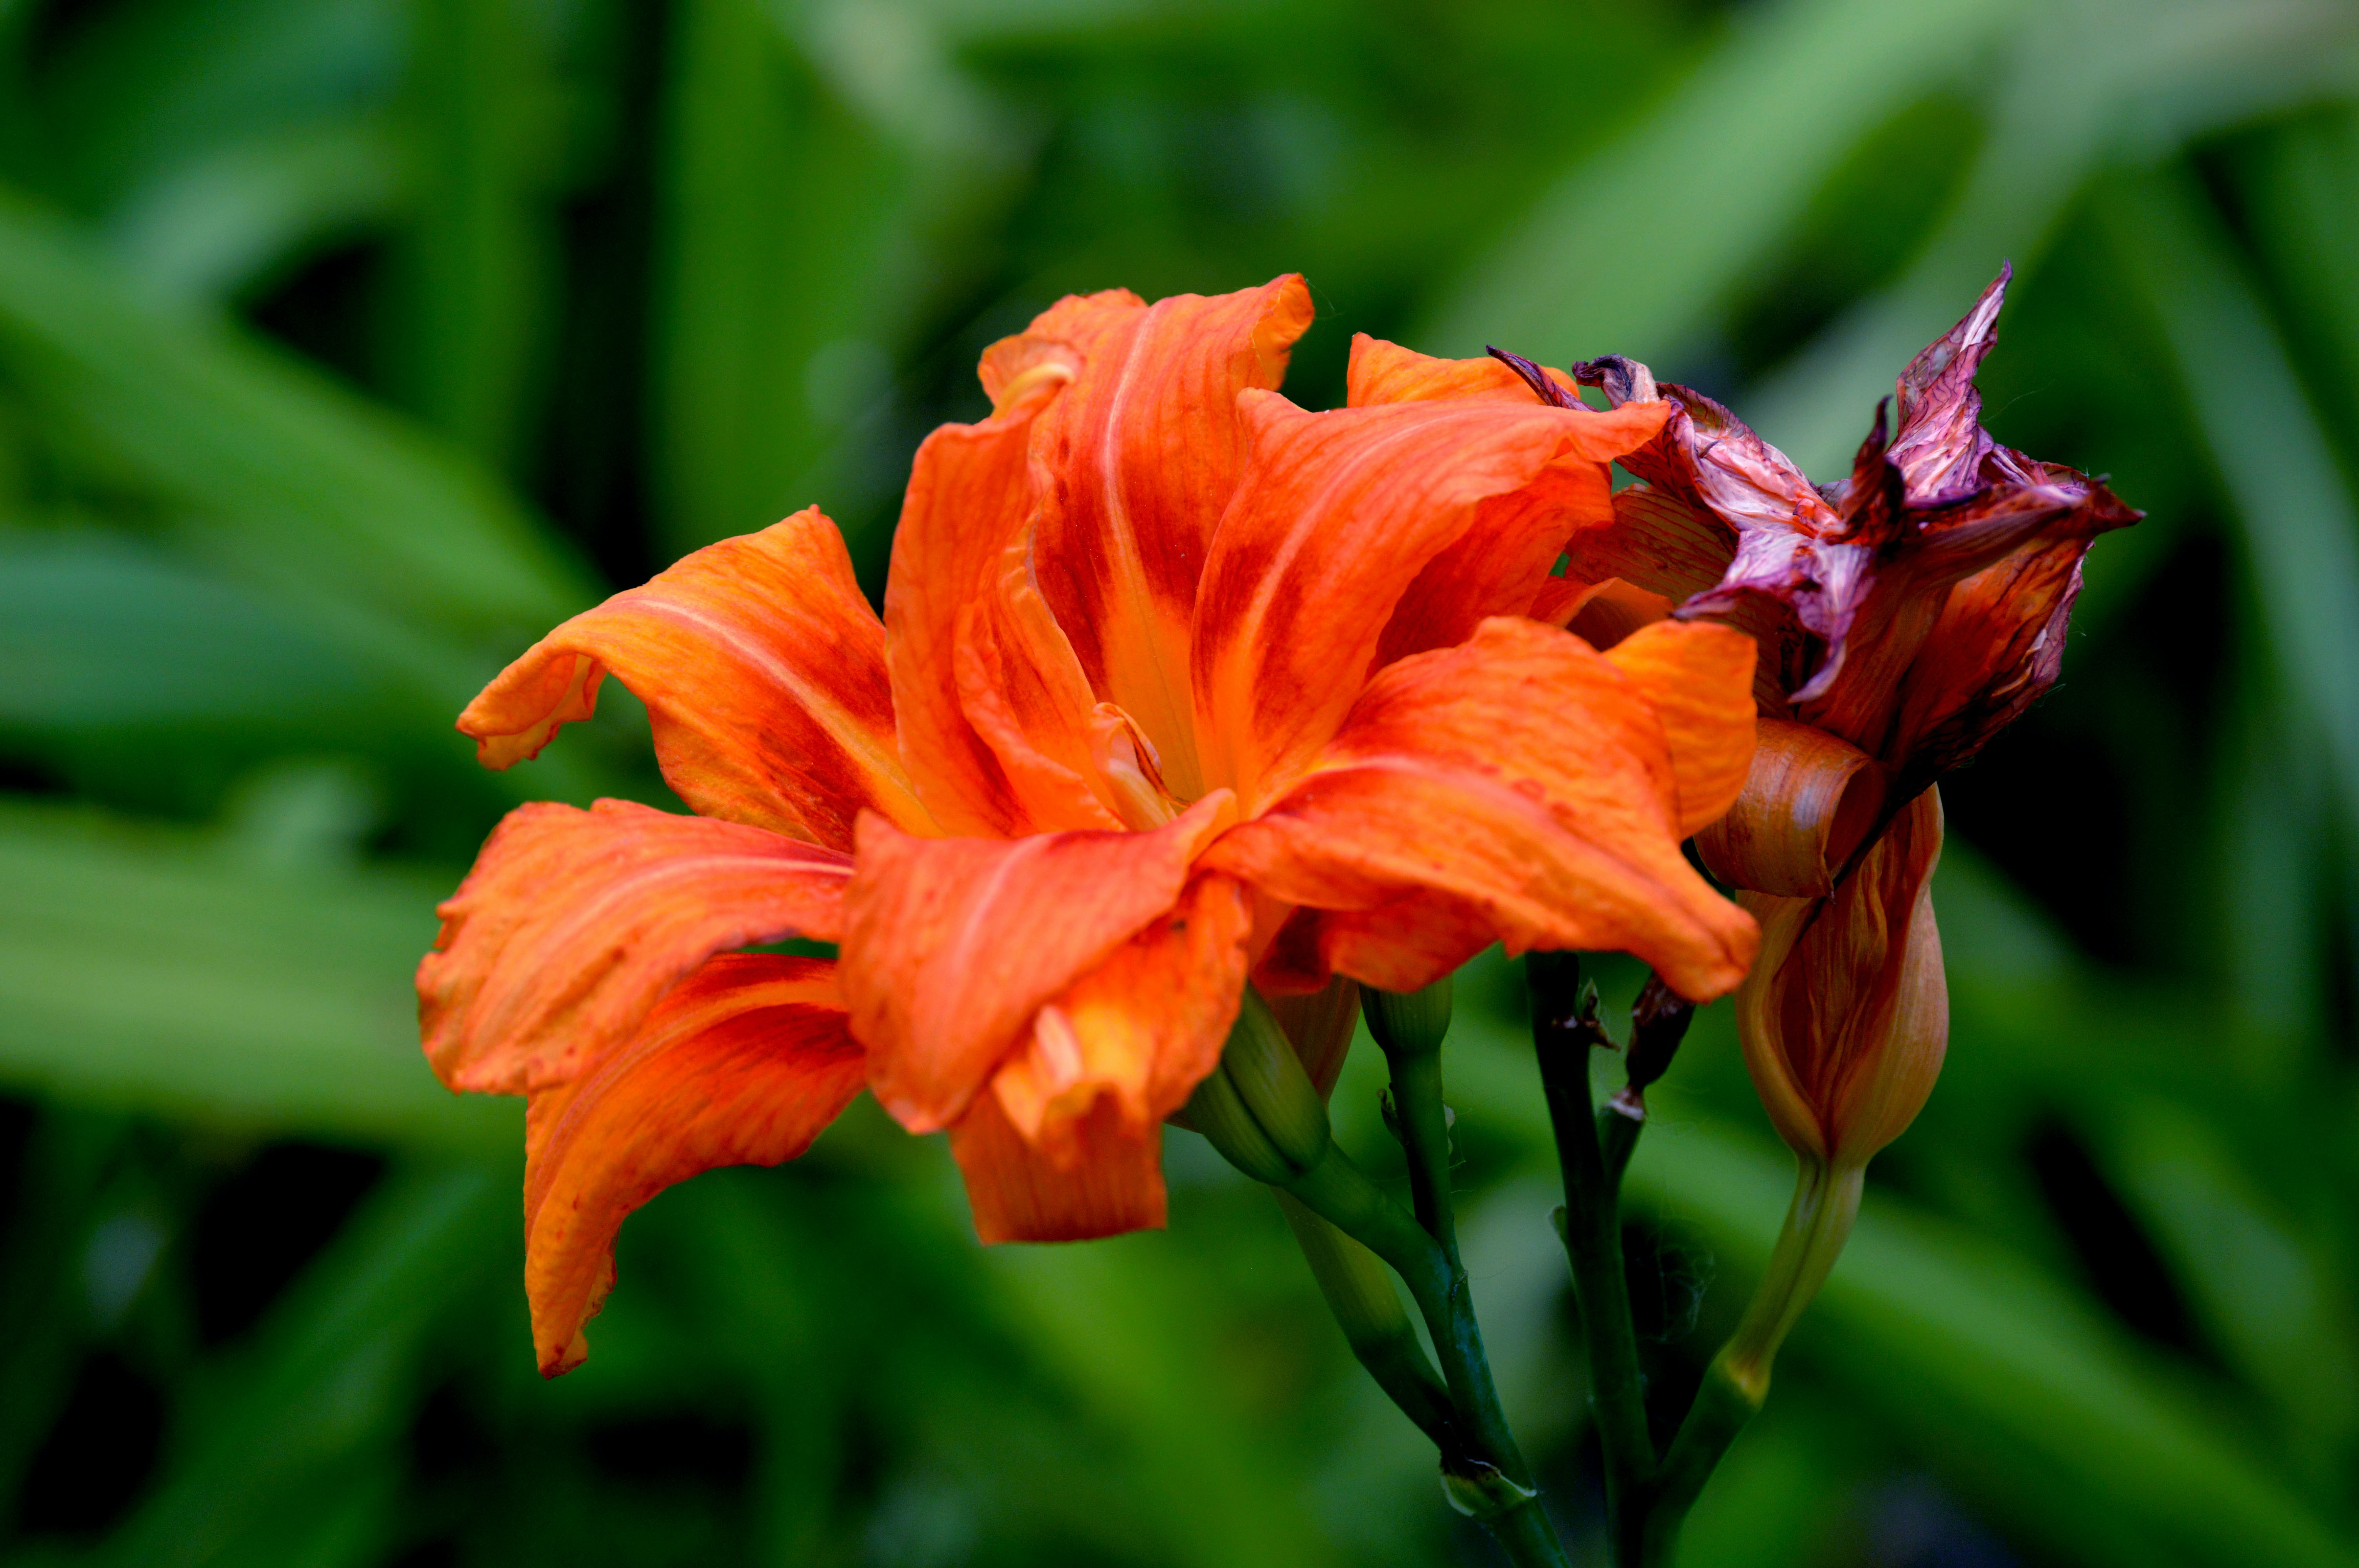 A close up shot of orange flower petals.